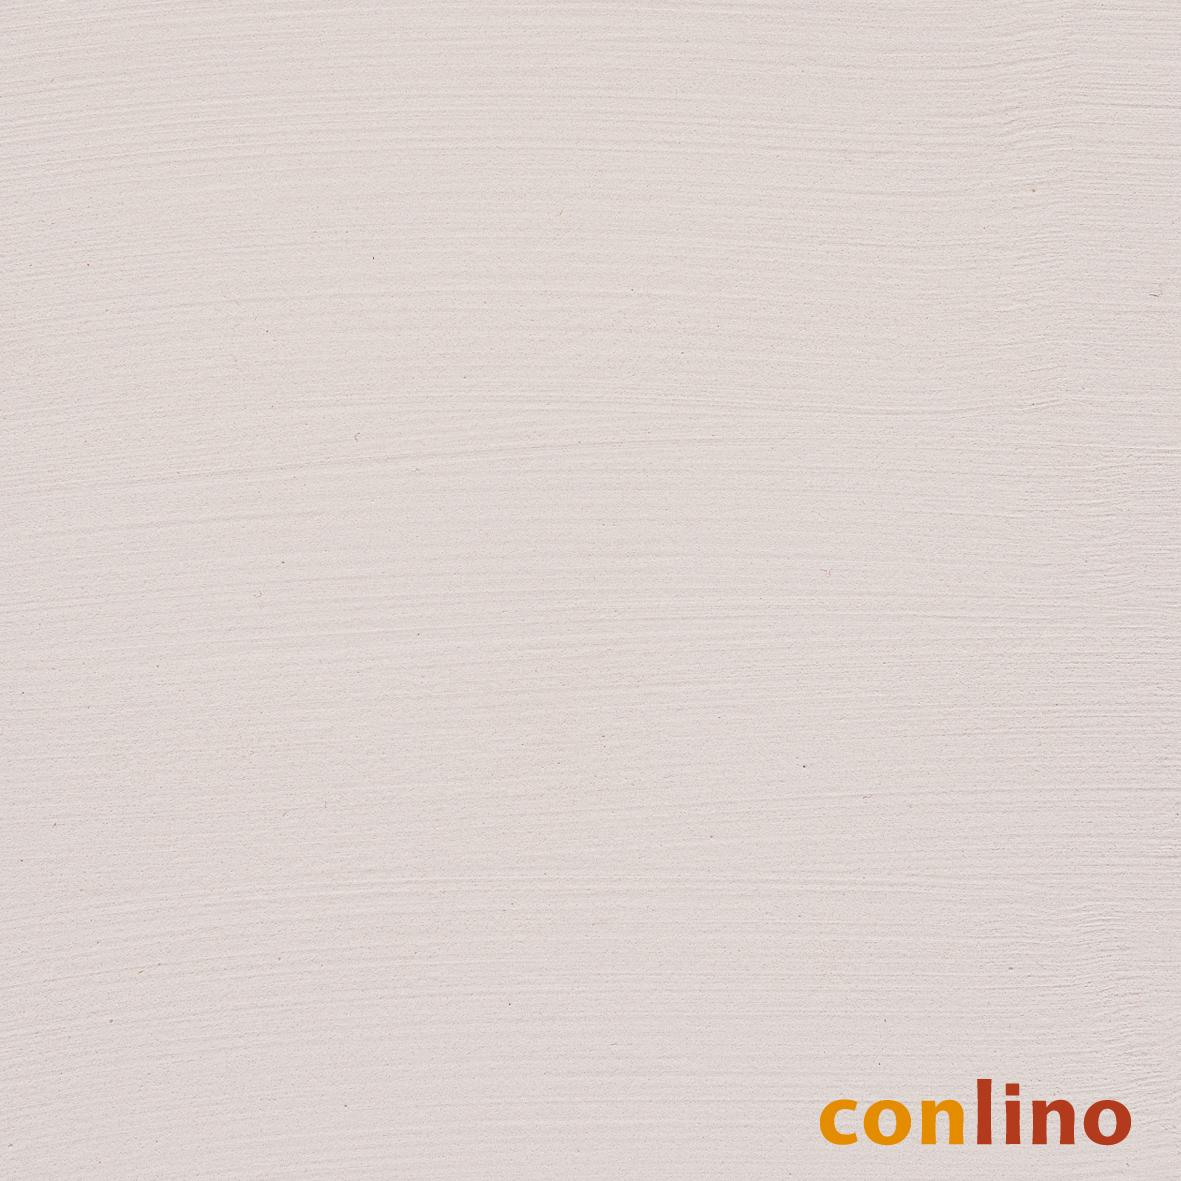 conlino Lehmfarbe Kiesel CL 106